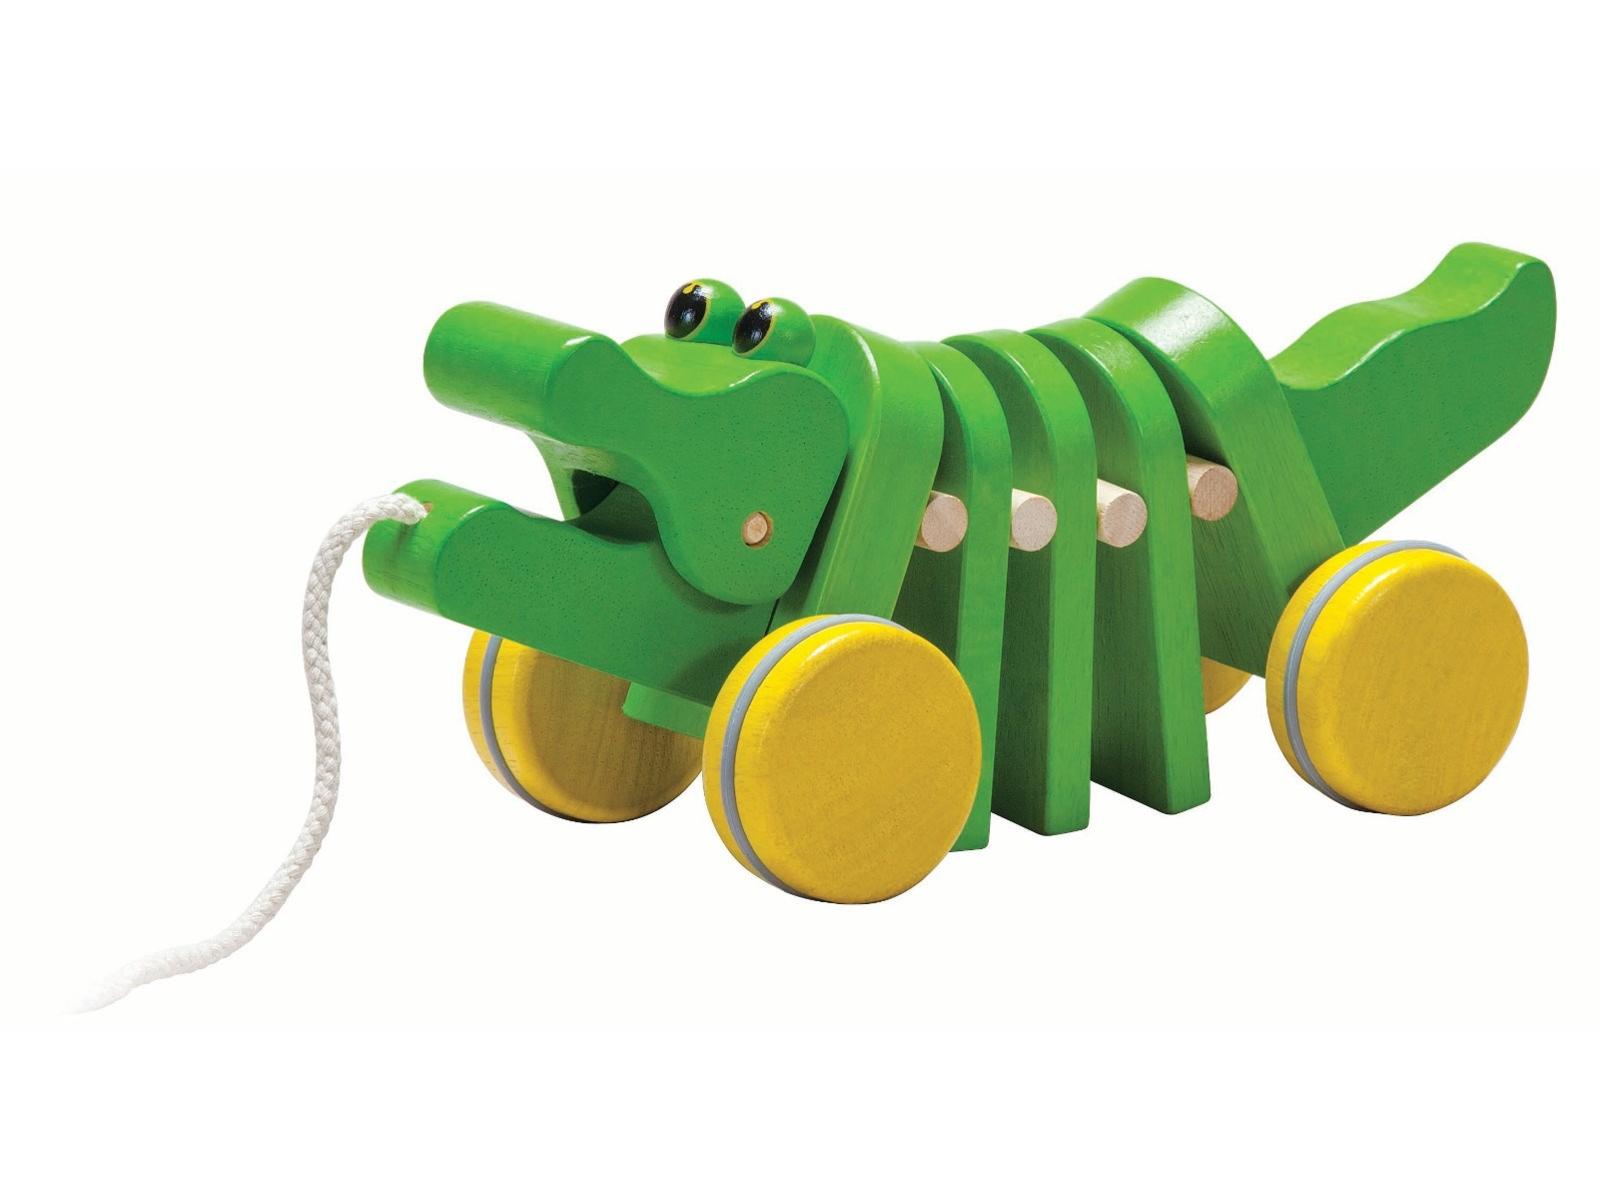 Ab 12 Monaten Gr/ö/ße:23 x 13 x 13,5 cm Lilliputiens 83004 Nachziehtier Nachziehspielzeug mit Anatole dem Krokodil